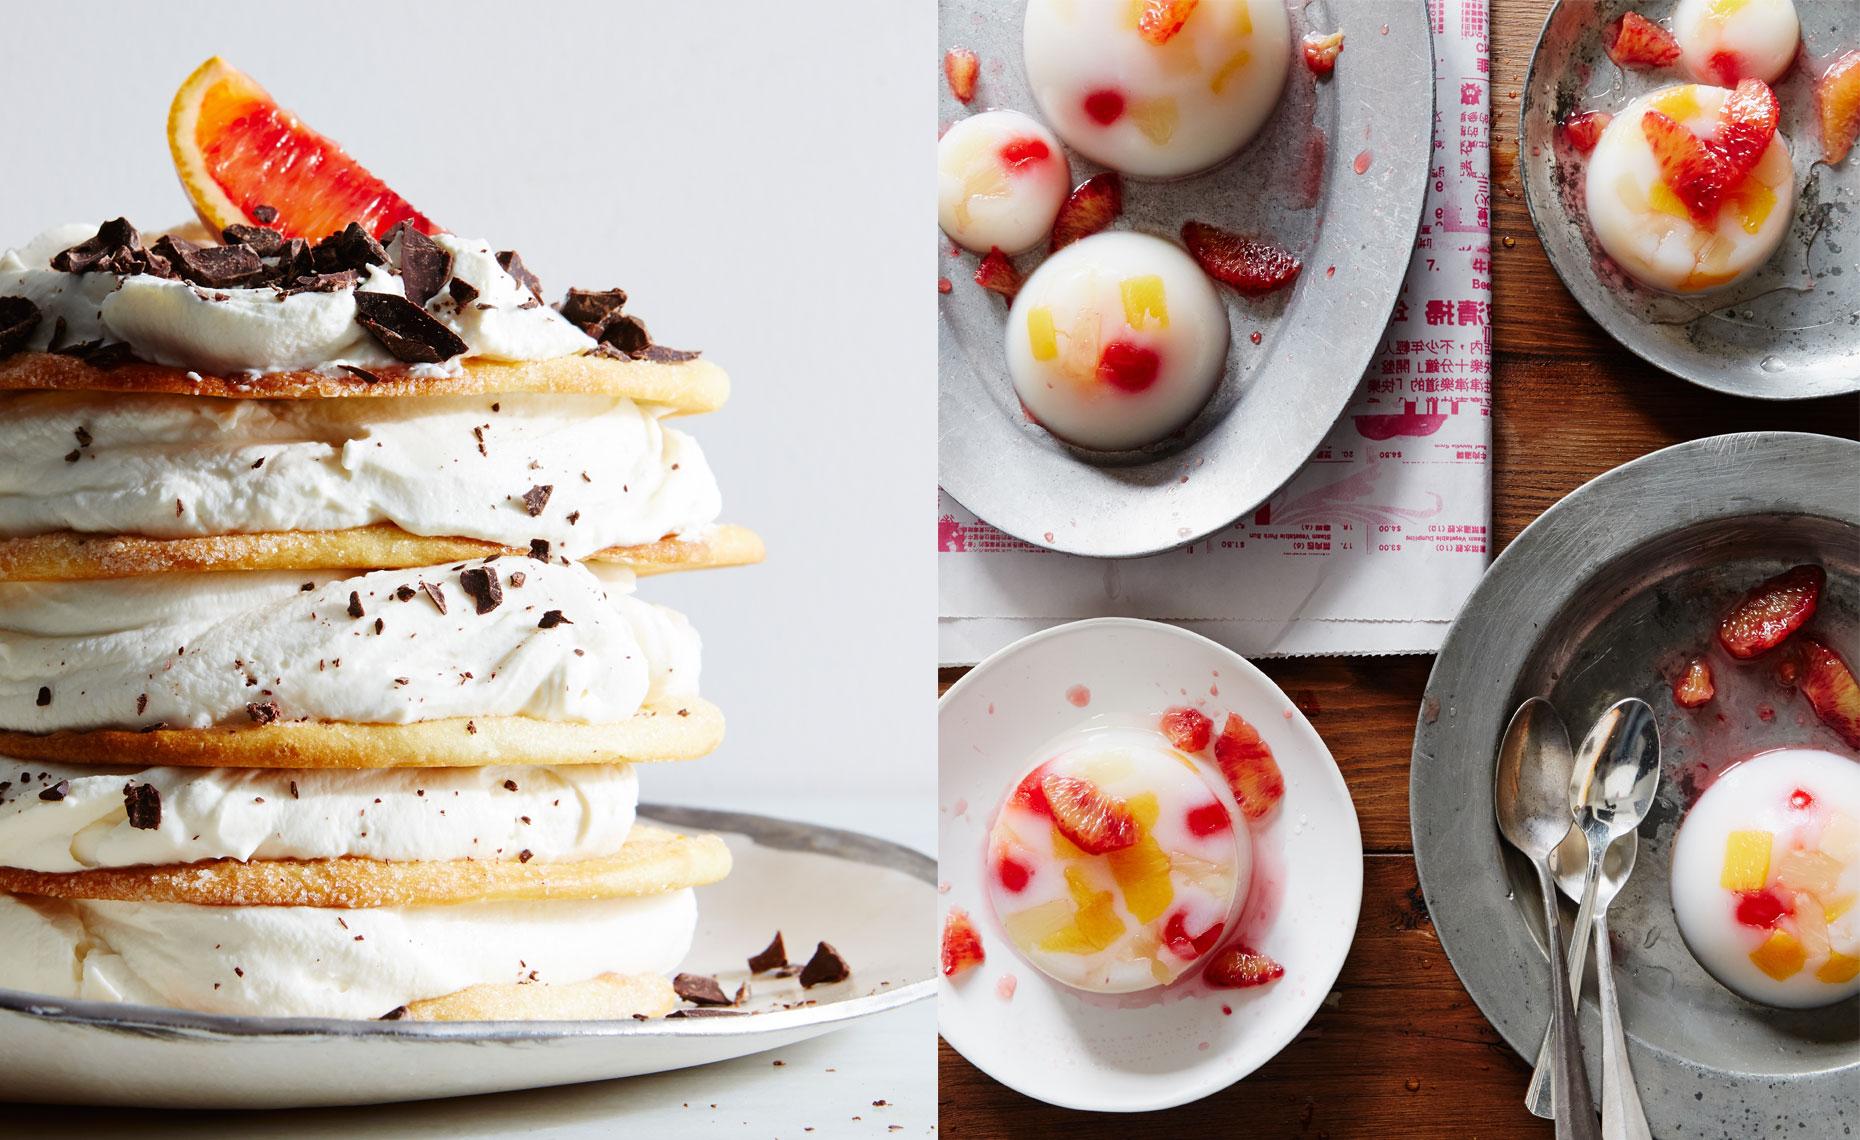 chocolate-cream-cake-and-agar-agar.jpg